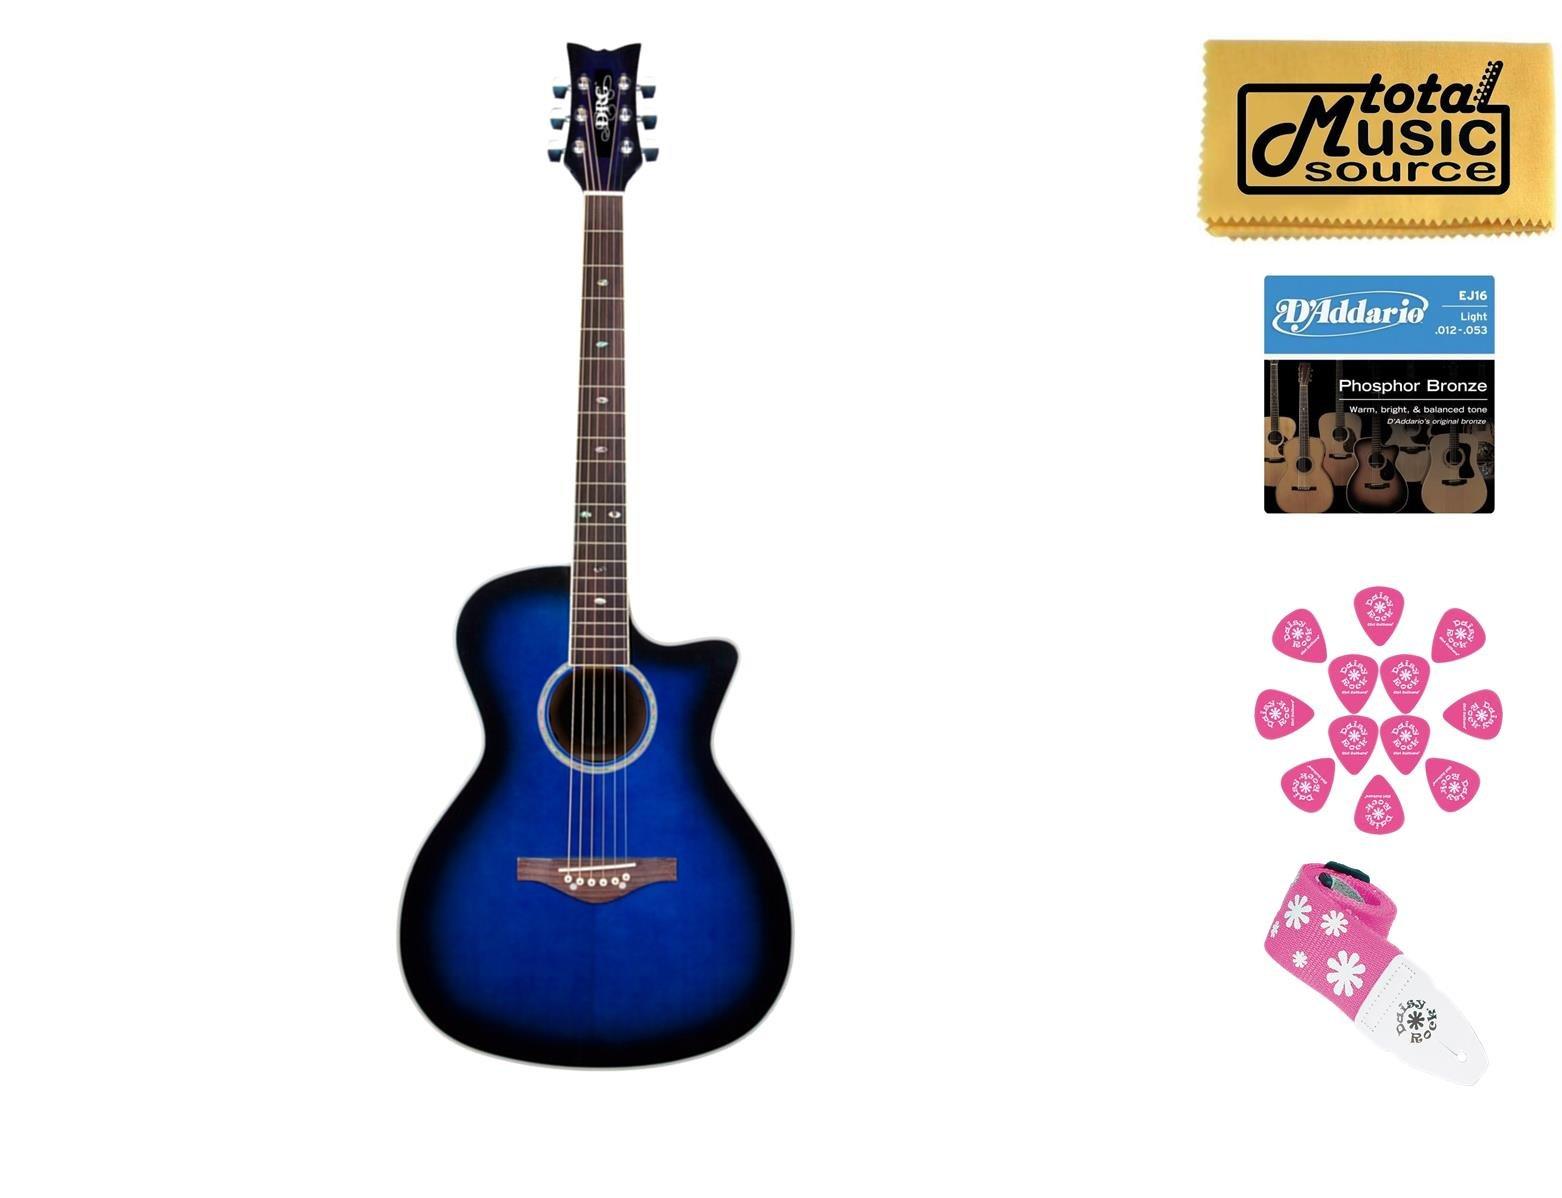 Daisy Rock Wildwood Artist A/E Guitar, Active EQ, Royal Blue Burst, DR-6278 by Daisy Rock